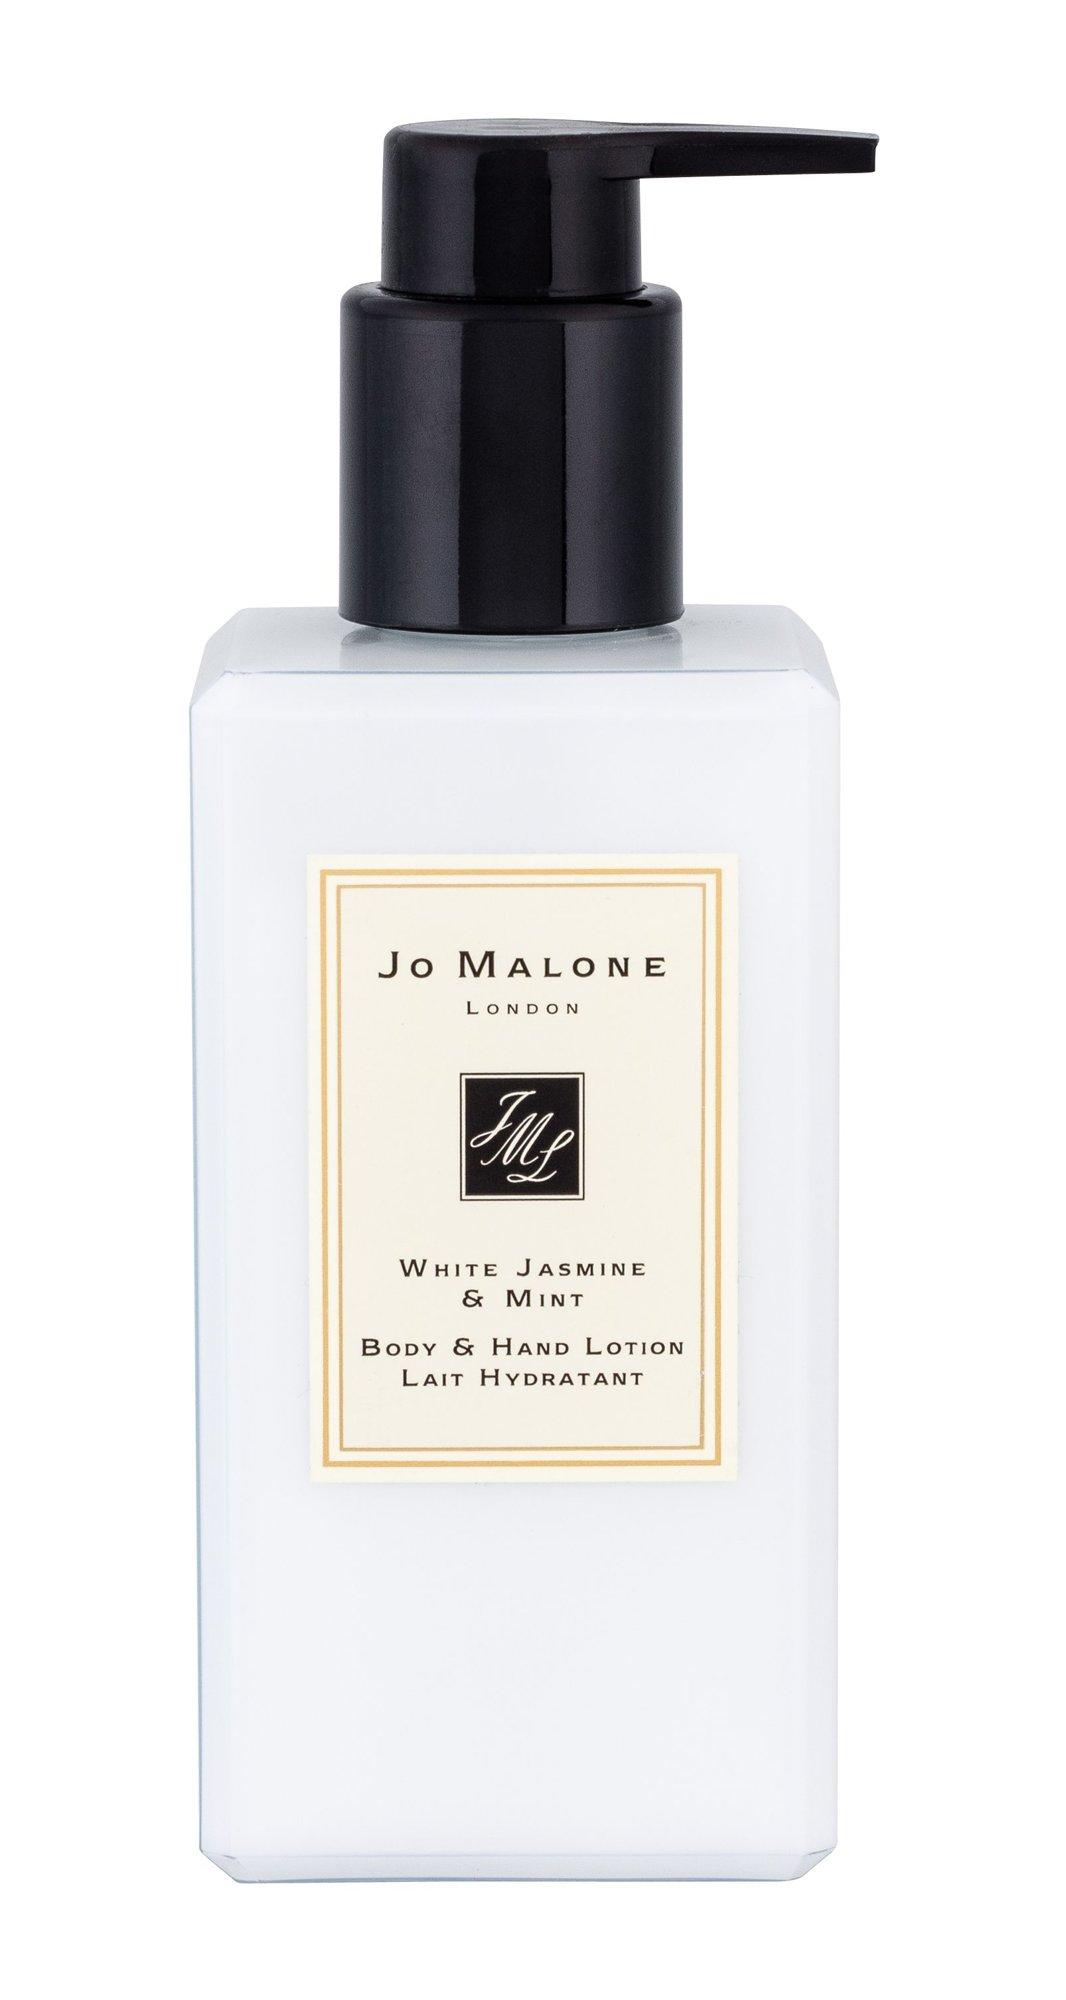 Jo Malone White Jasmine & Mint Body Lotion 250ml